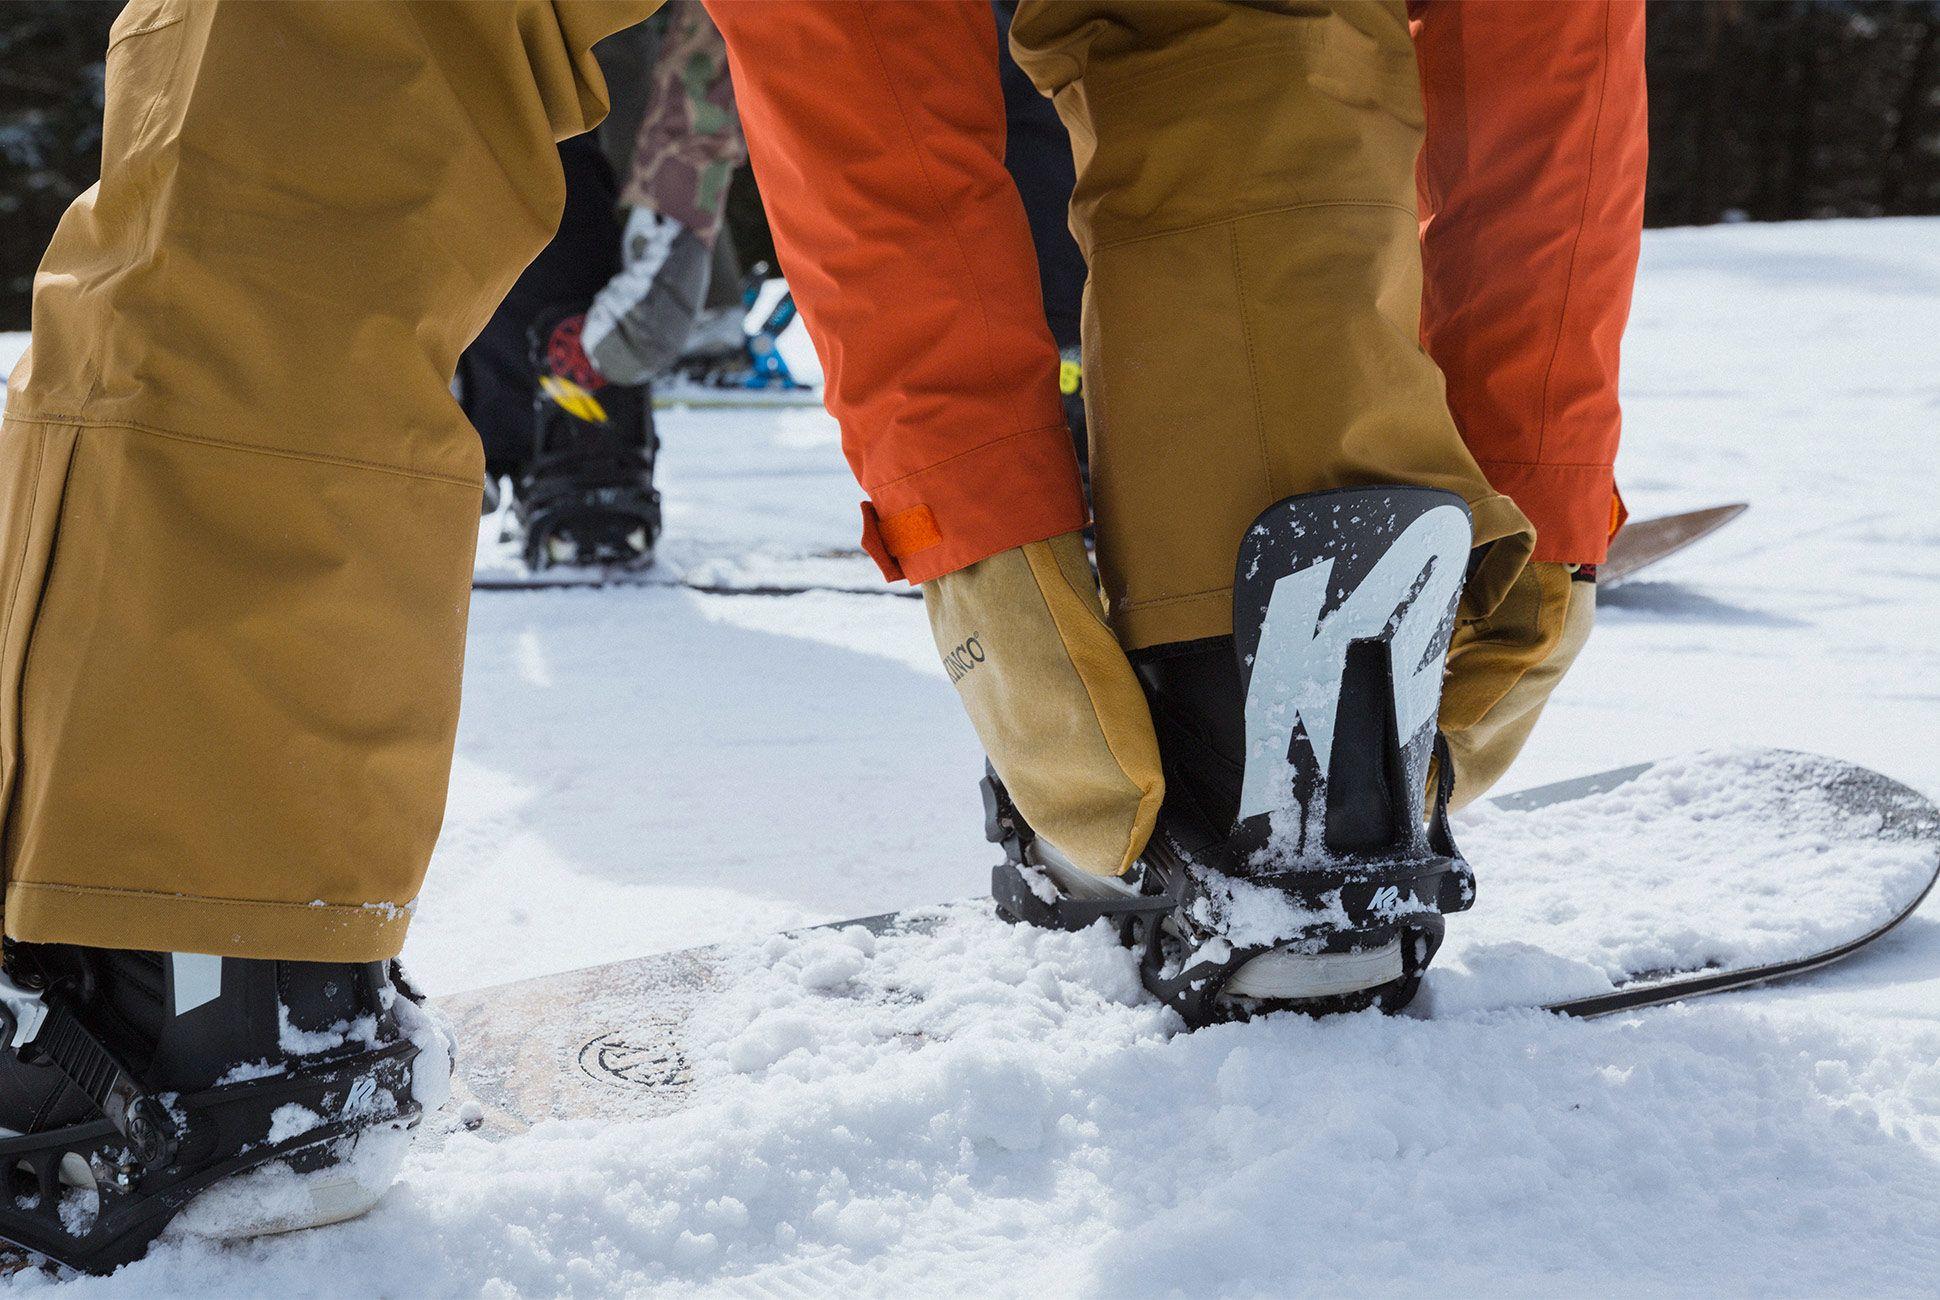 ultimate-ski-and-snow-gear-patrol-dakine-slide-2